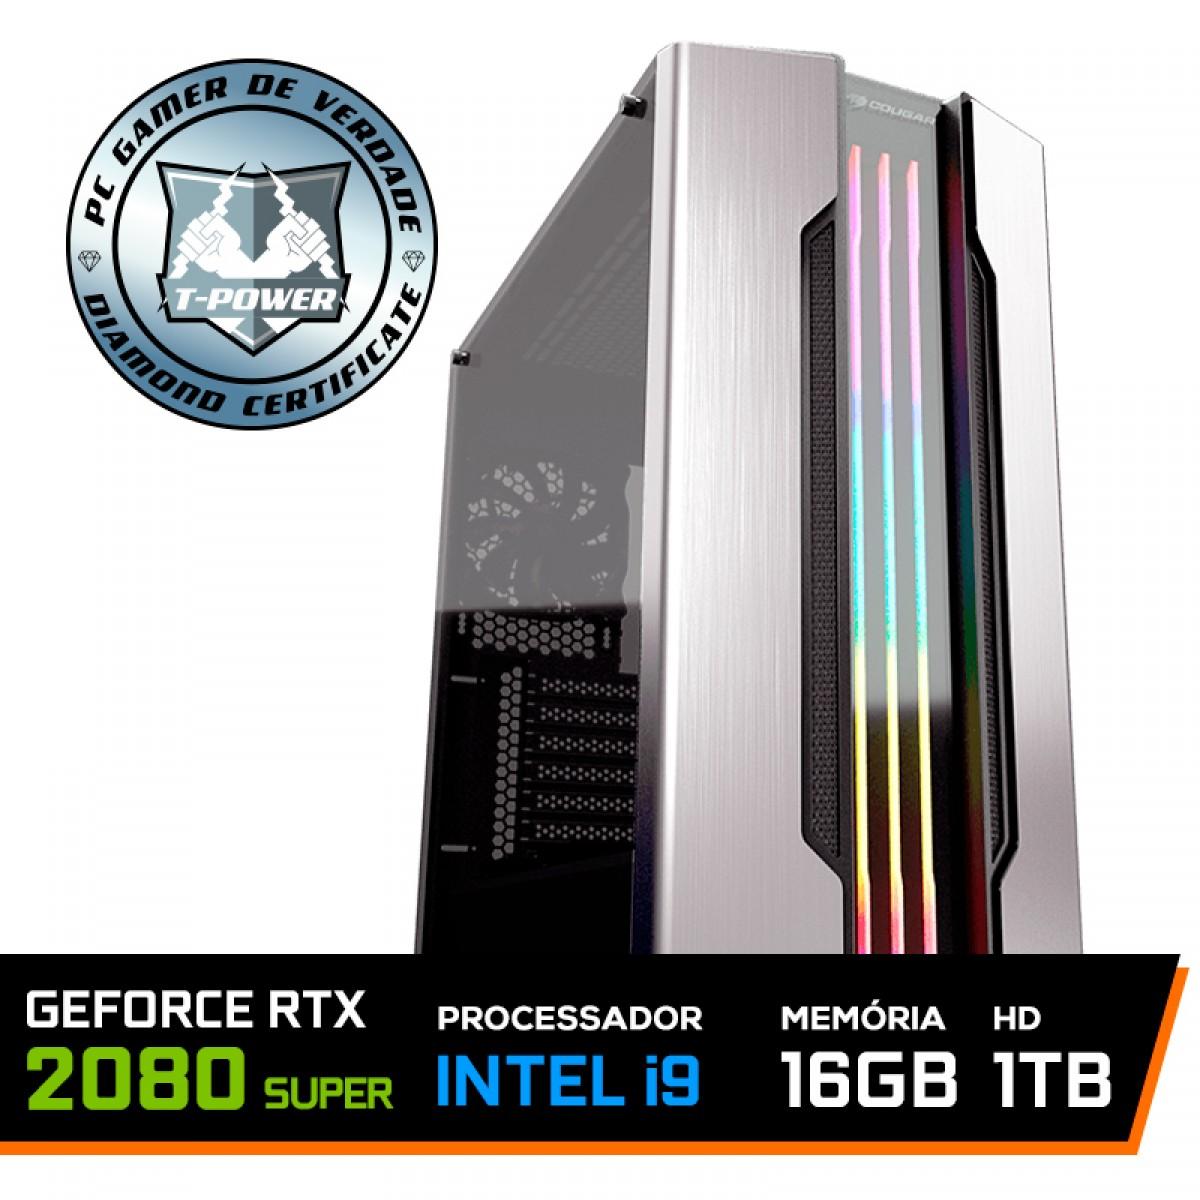 Pc Gamer T-Power Inferno LVL-5 Intel I9 9900KF 3.60GHz / Geforce RTX 2080 Super / DDR4 16GB / HD 1TB / 750W